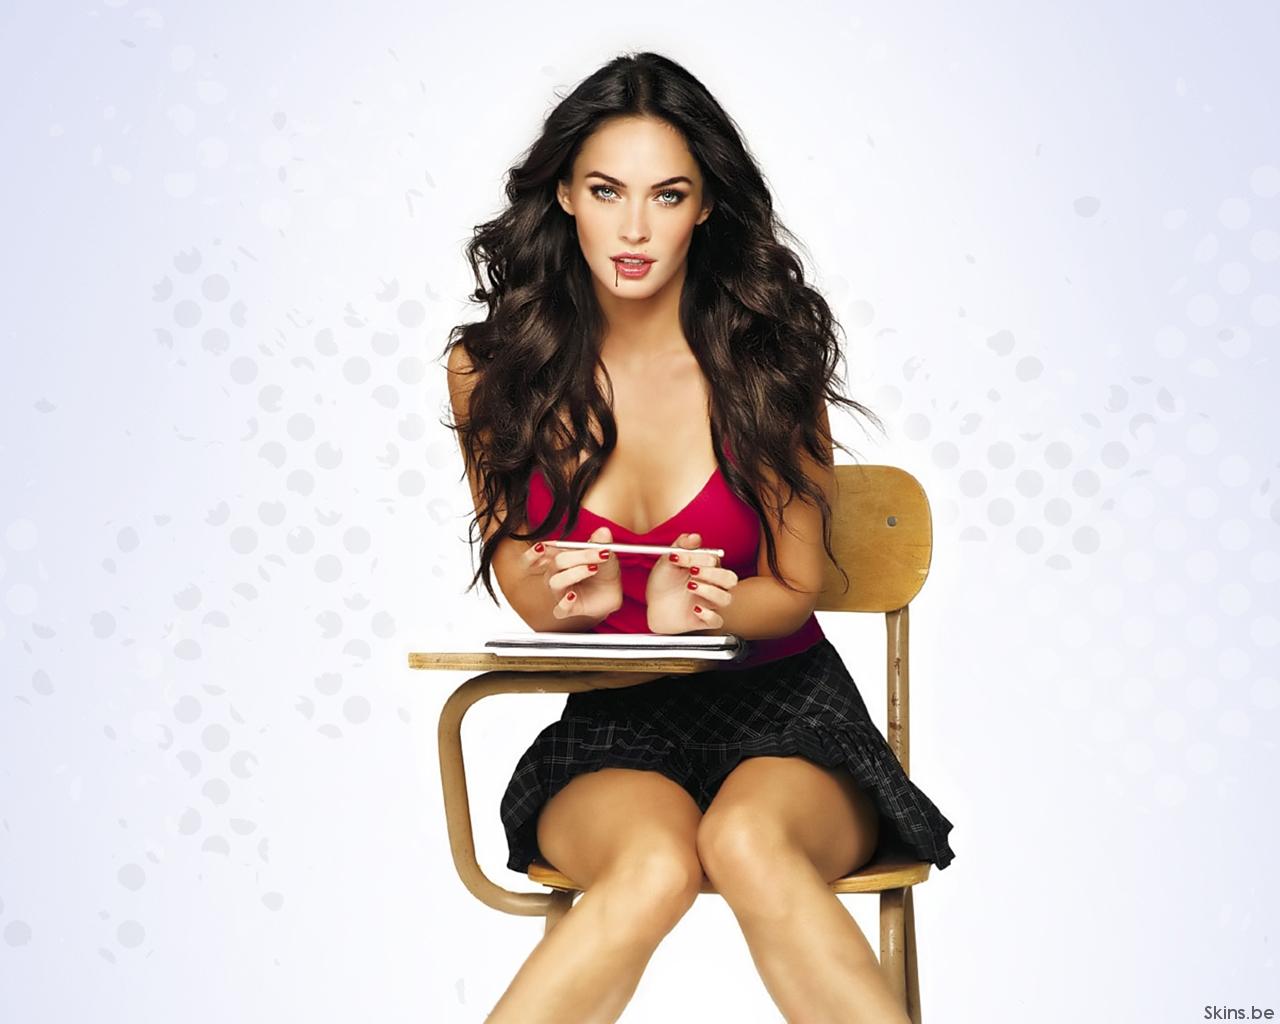 High quality Megan Fox wallpaper Celebrities Female 1280x1024 1280x1024